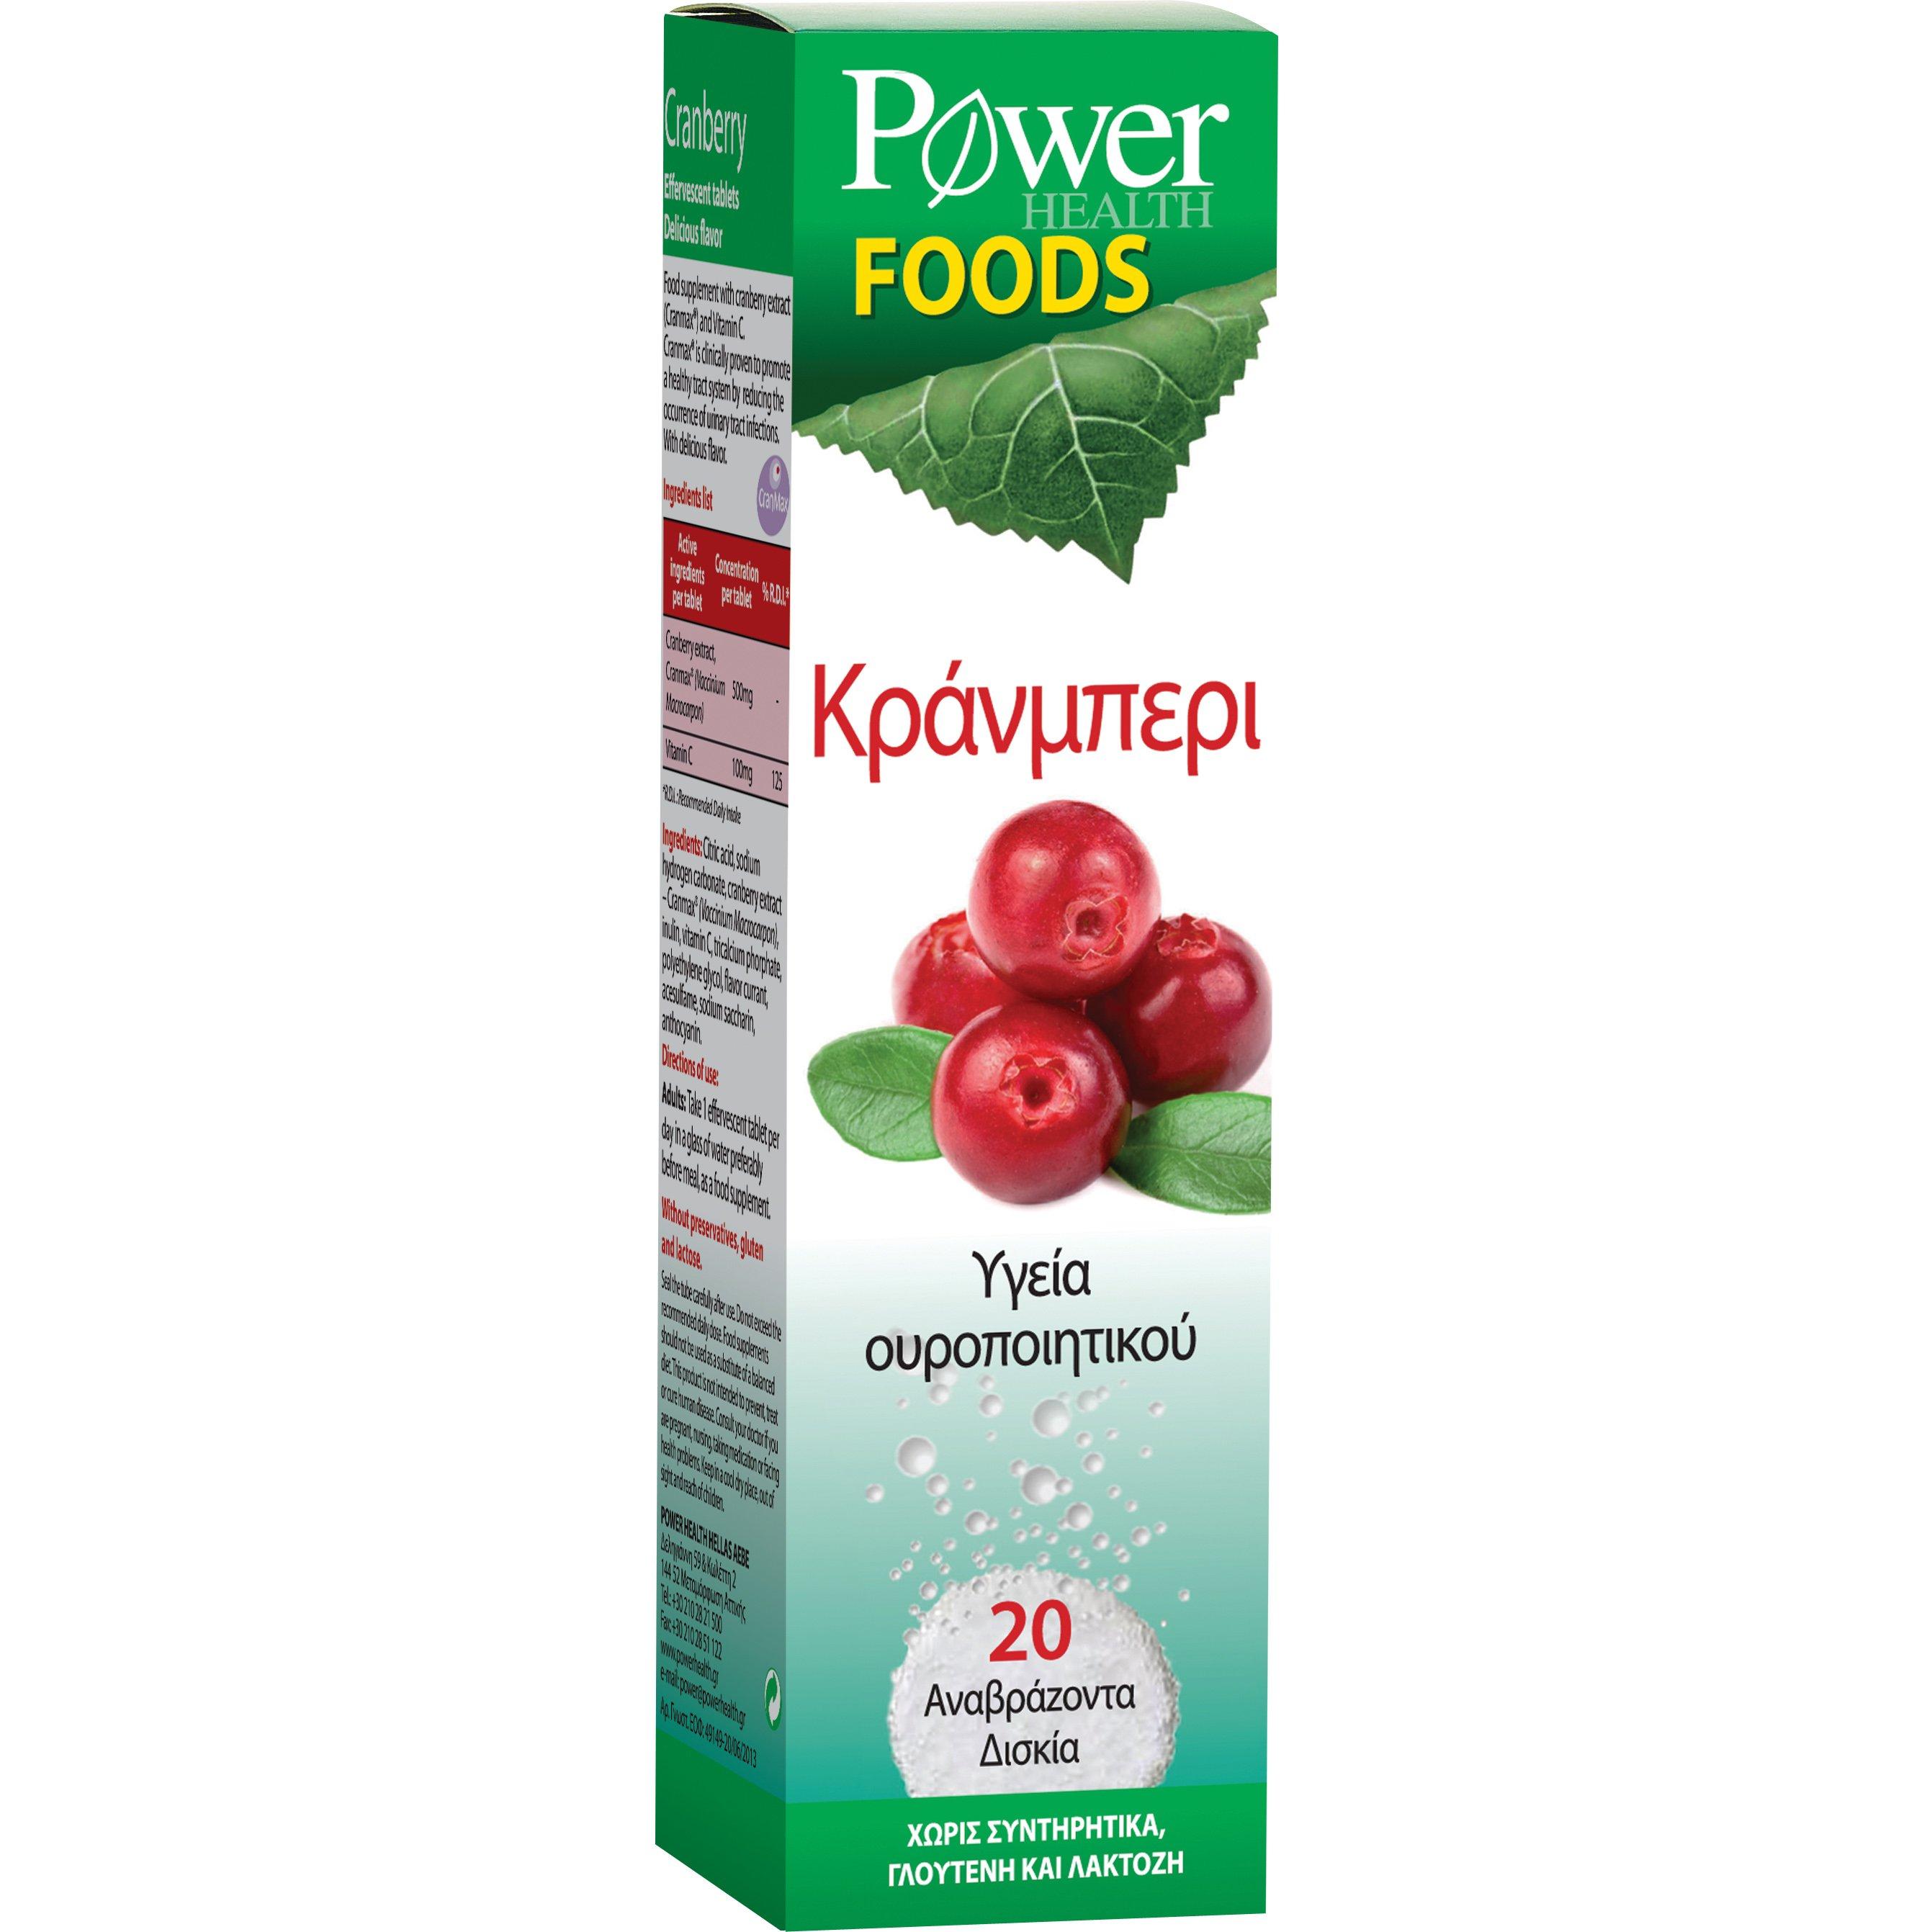 Power Foods Cranberry 20 Effer. Tabs – Power Health,Συμπλήρωμα Διατροφής για την Καλή Υγεία του Ουροποιητικού